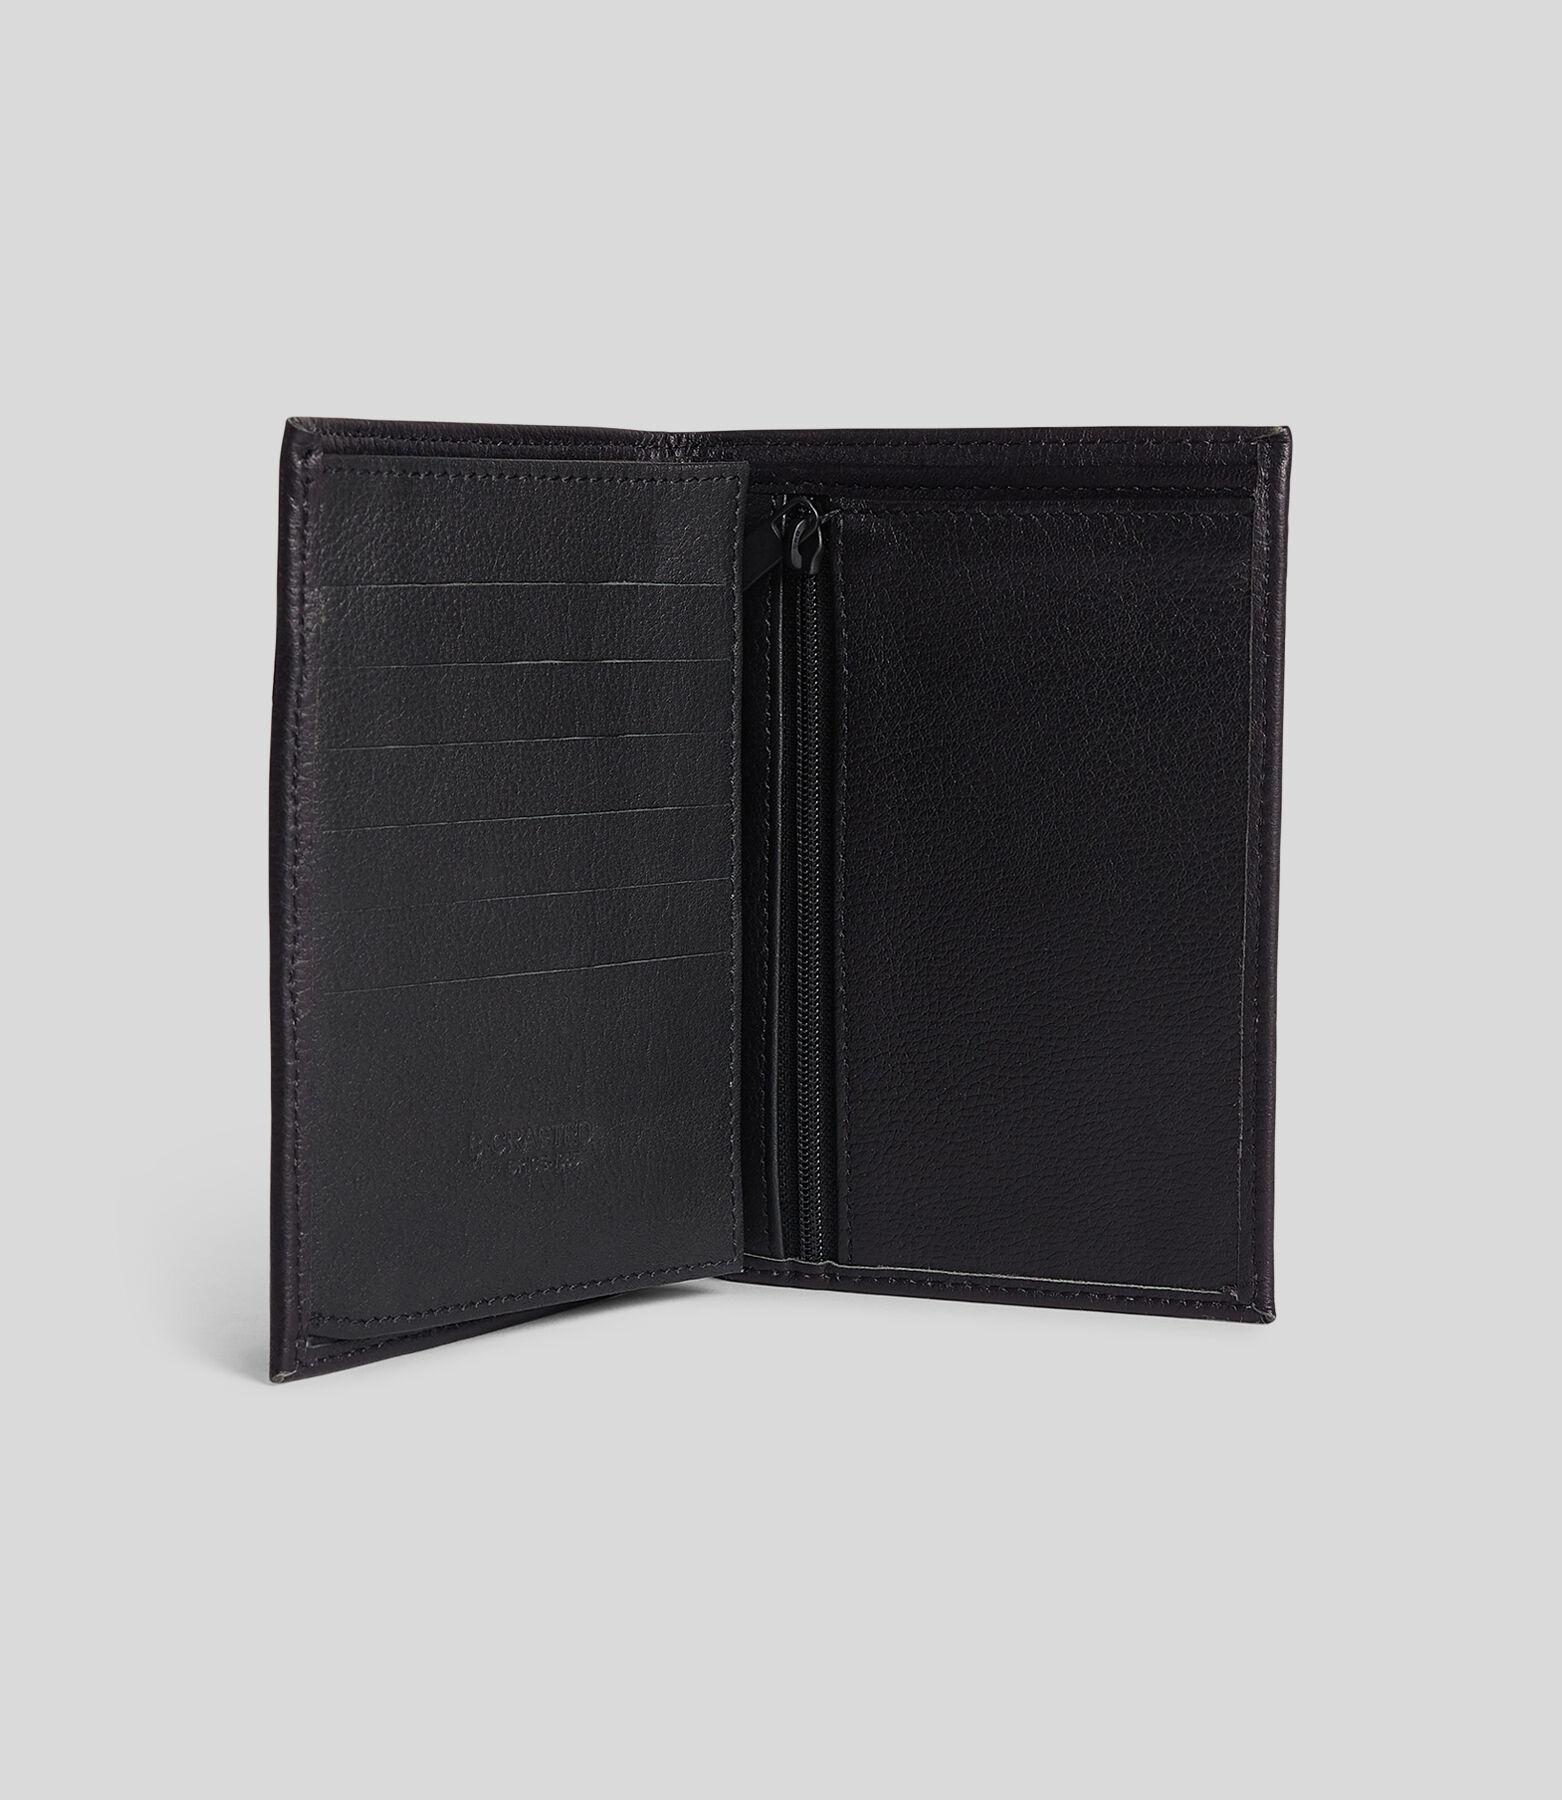 Portefeuille homme vertical cuir noir